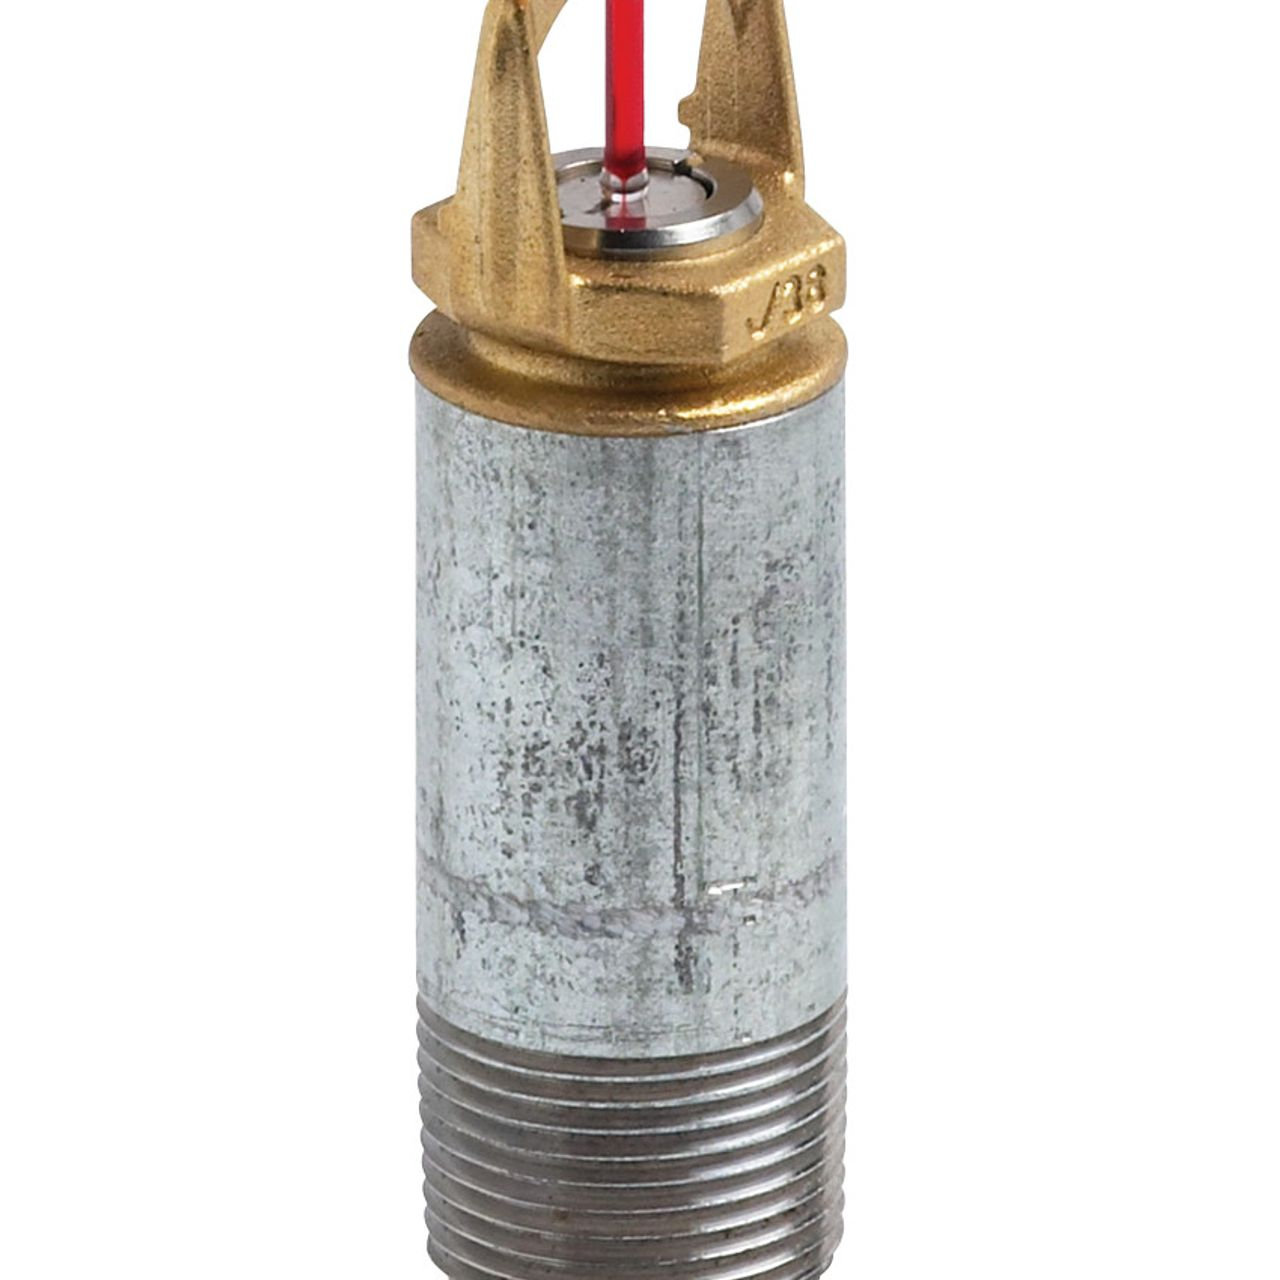 FireLock™ Model V3604